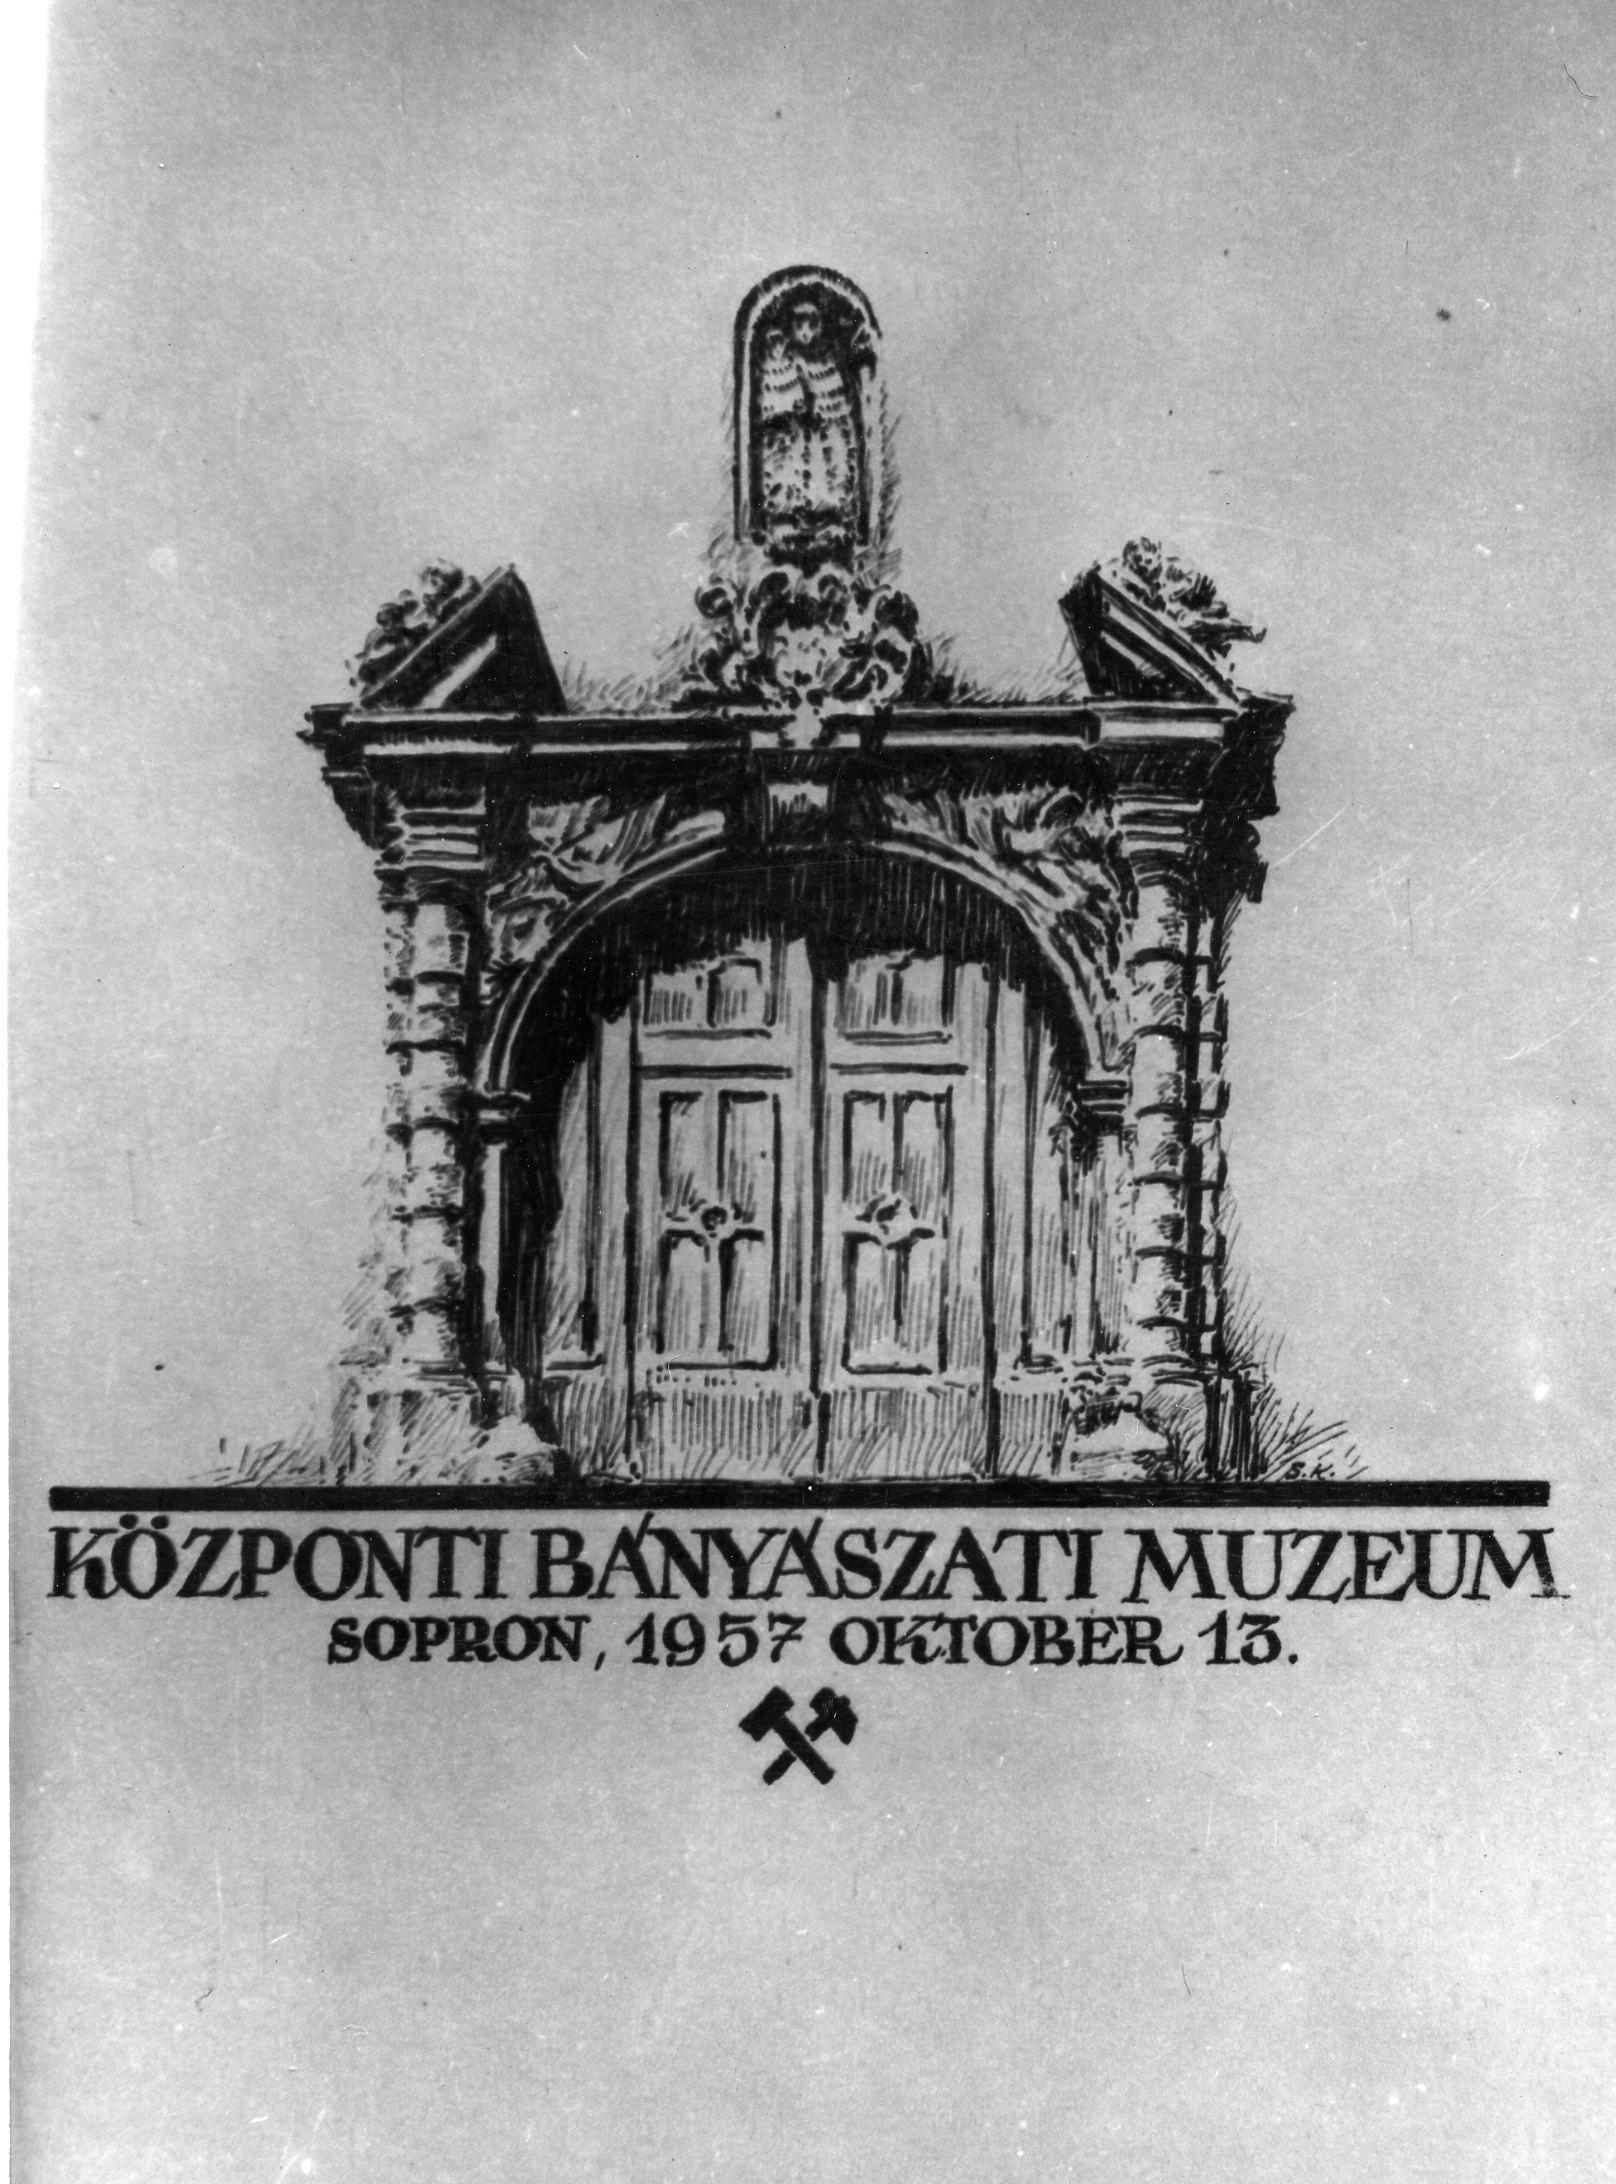 muzeum_kapuja_sterbencz_karoly_faller_1966_f1668553.jpg